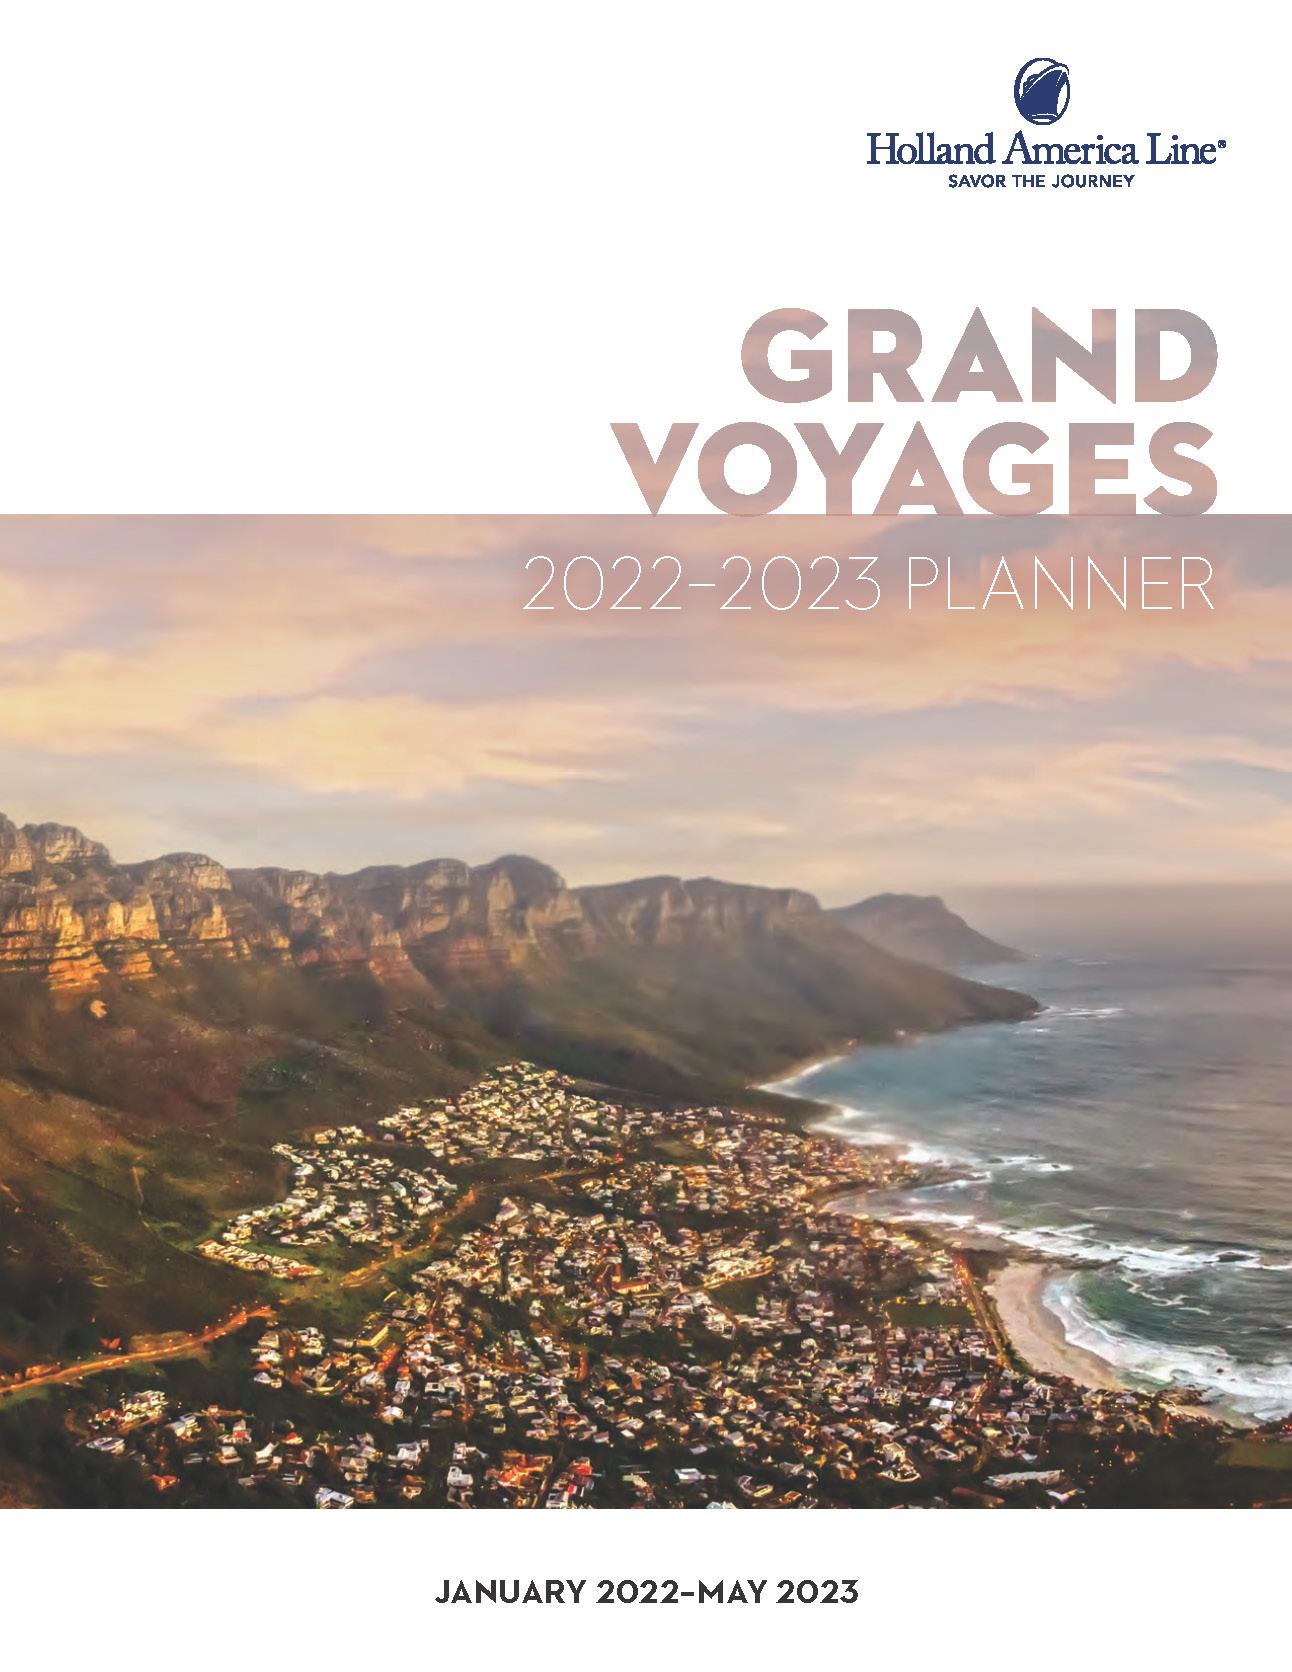 Catalogo Holland America Line Grandes Viajes 2022-2023